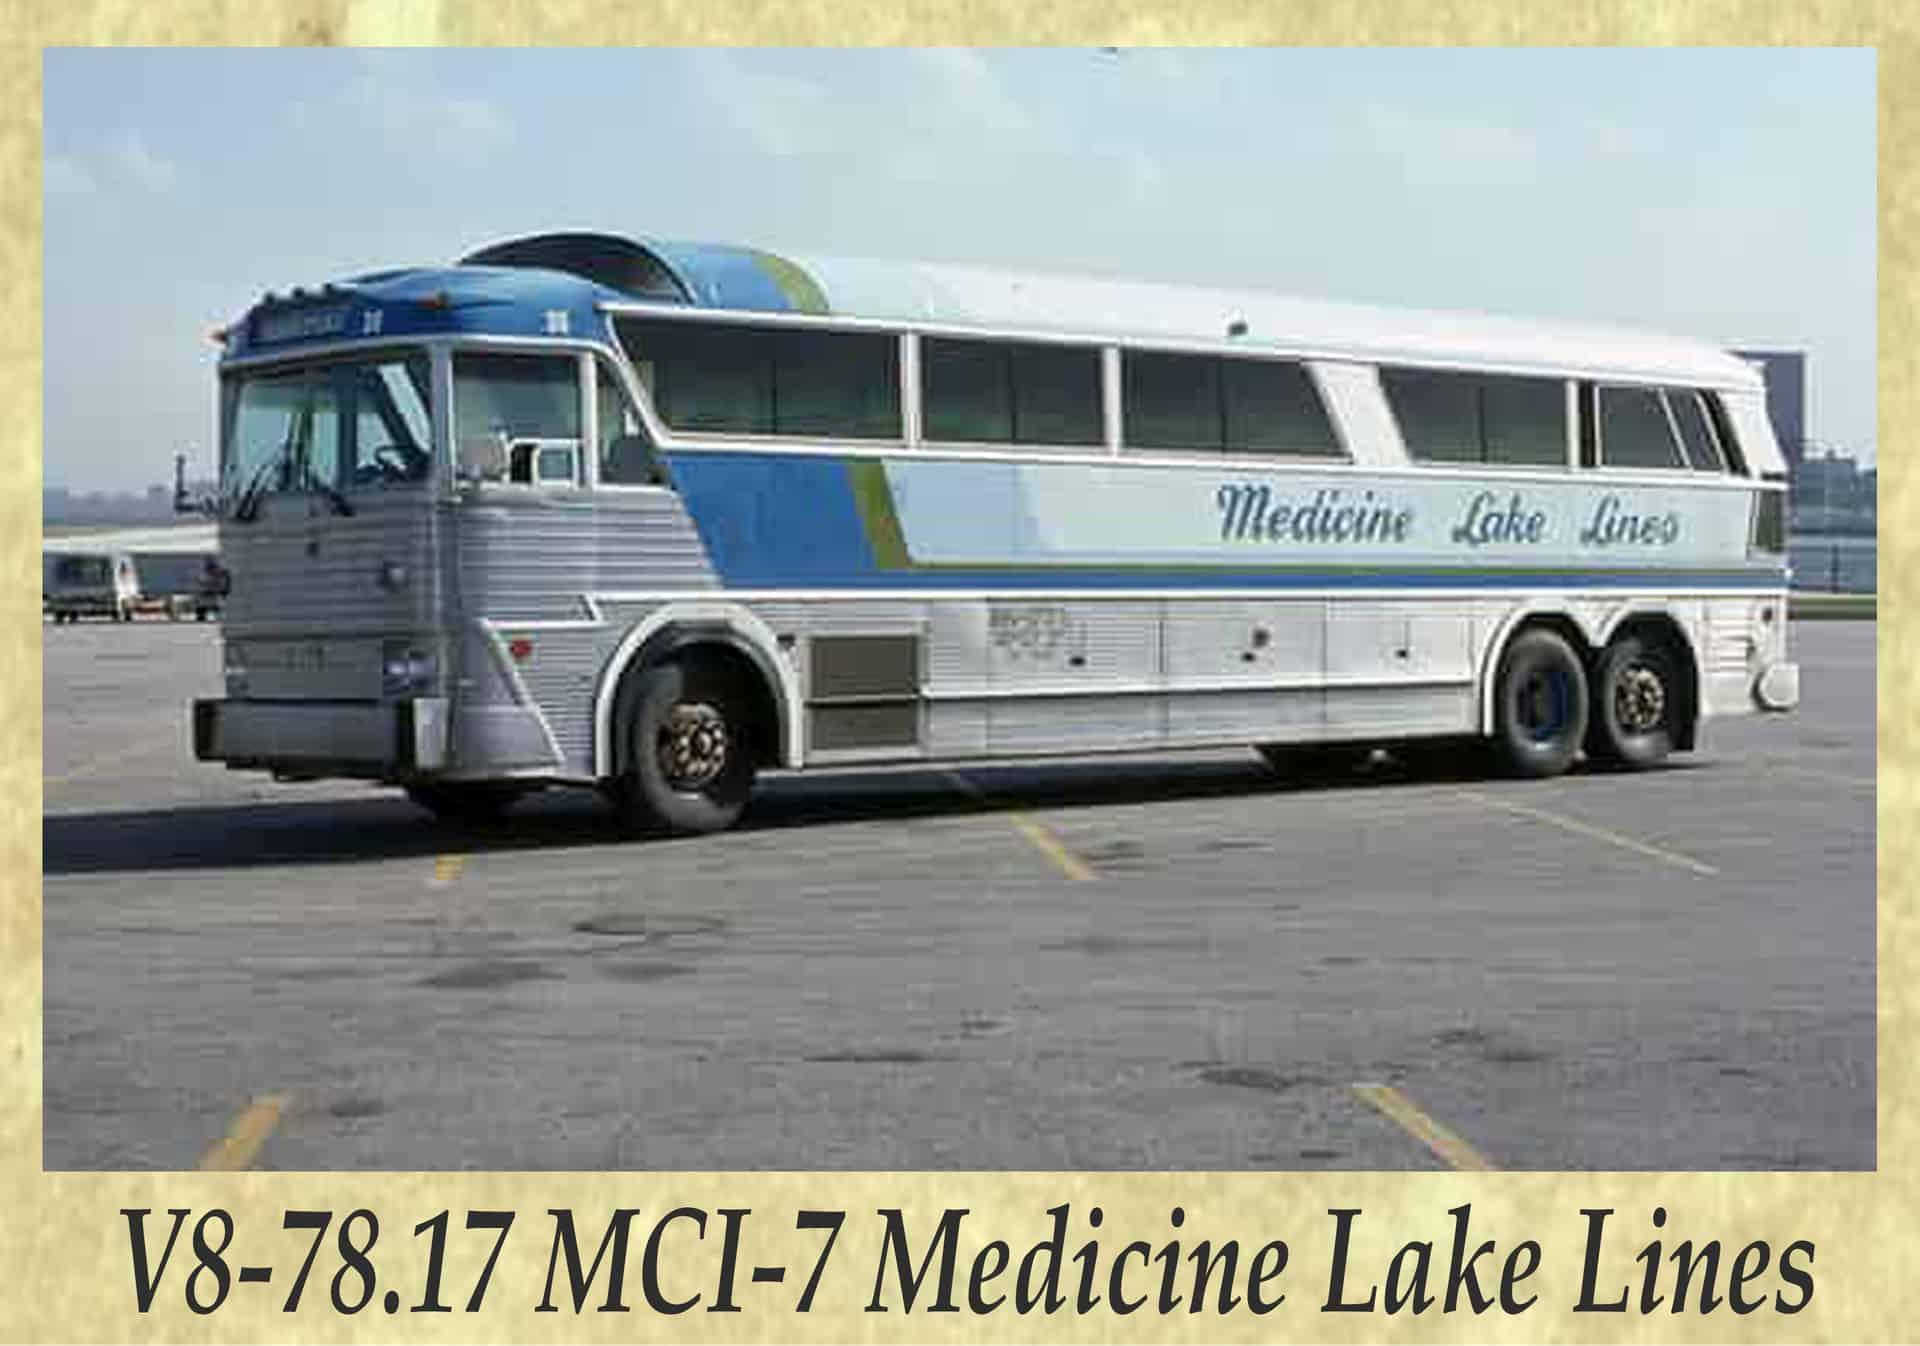 V8-78.17 MCI-7 Medicine Lake Lines